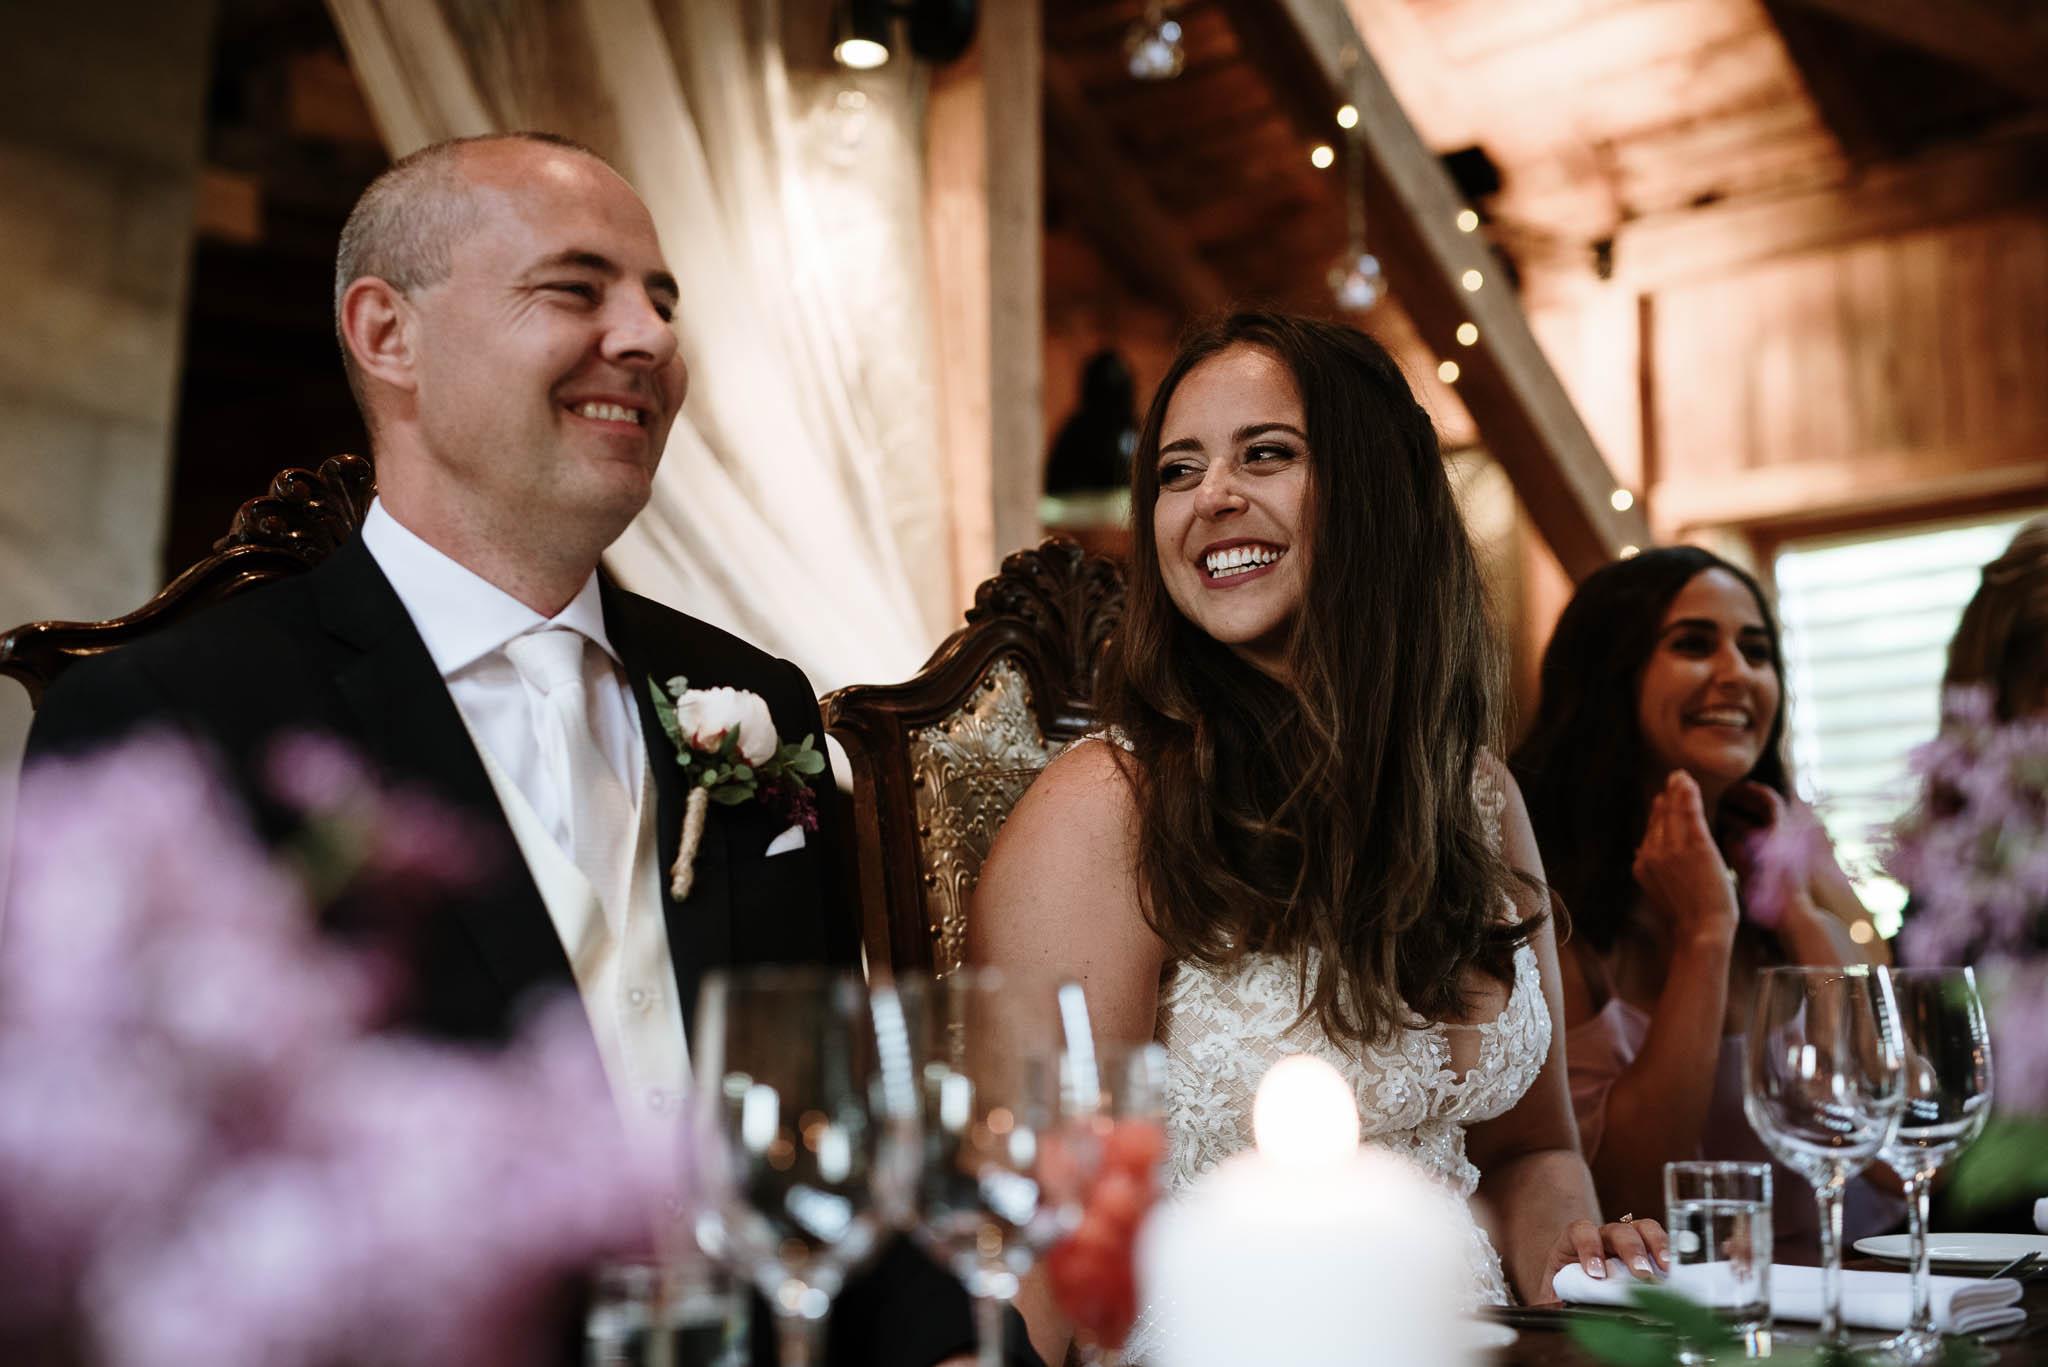 Bryllupsfotograf i Lofoten - wedding photographer Lofoten - bryllup harstad-37.jpg